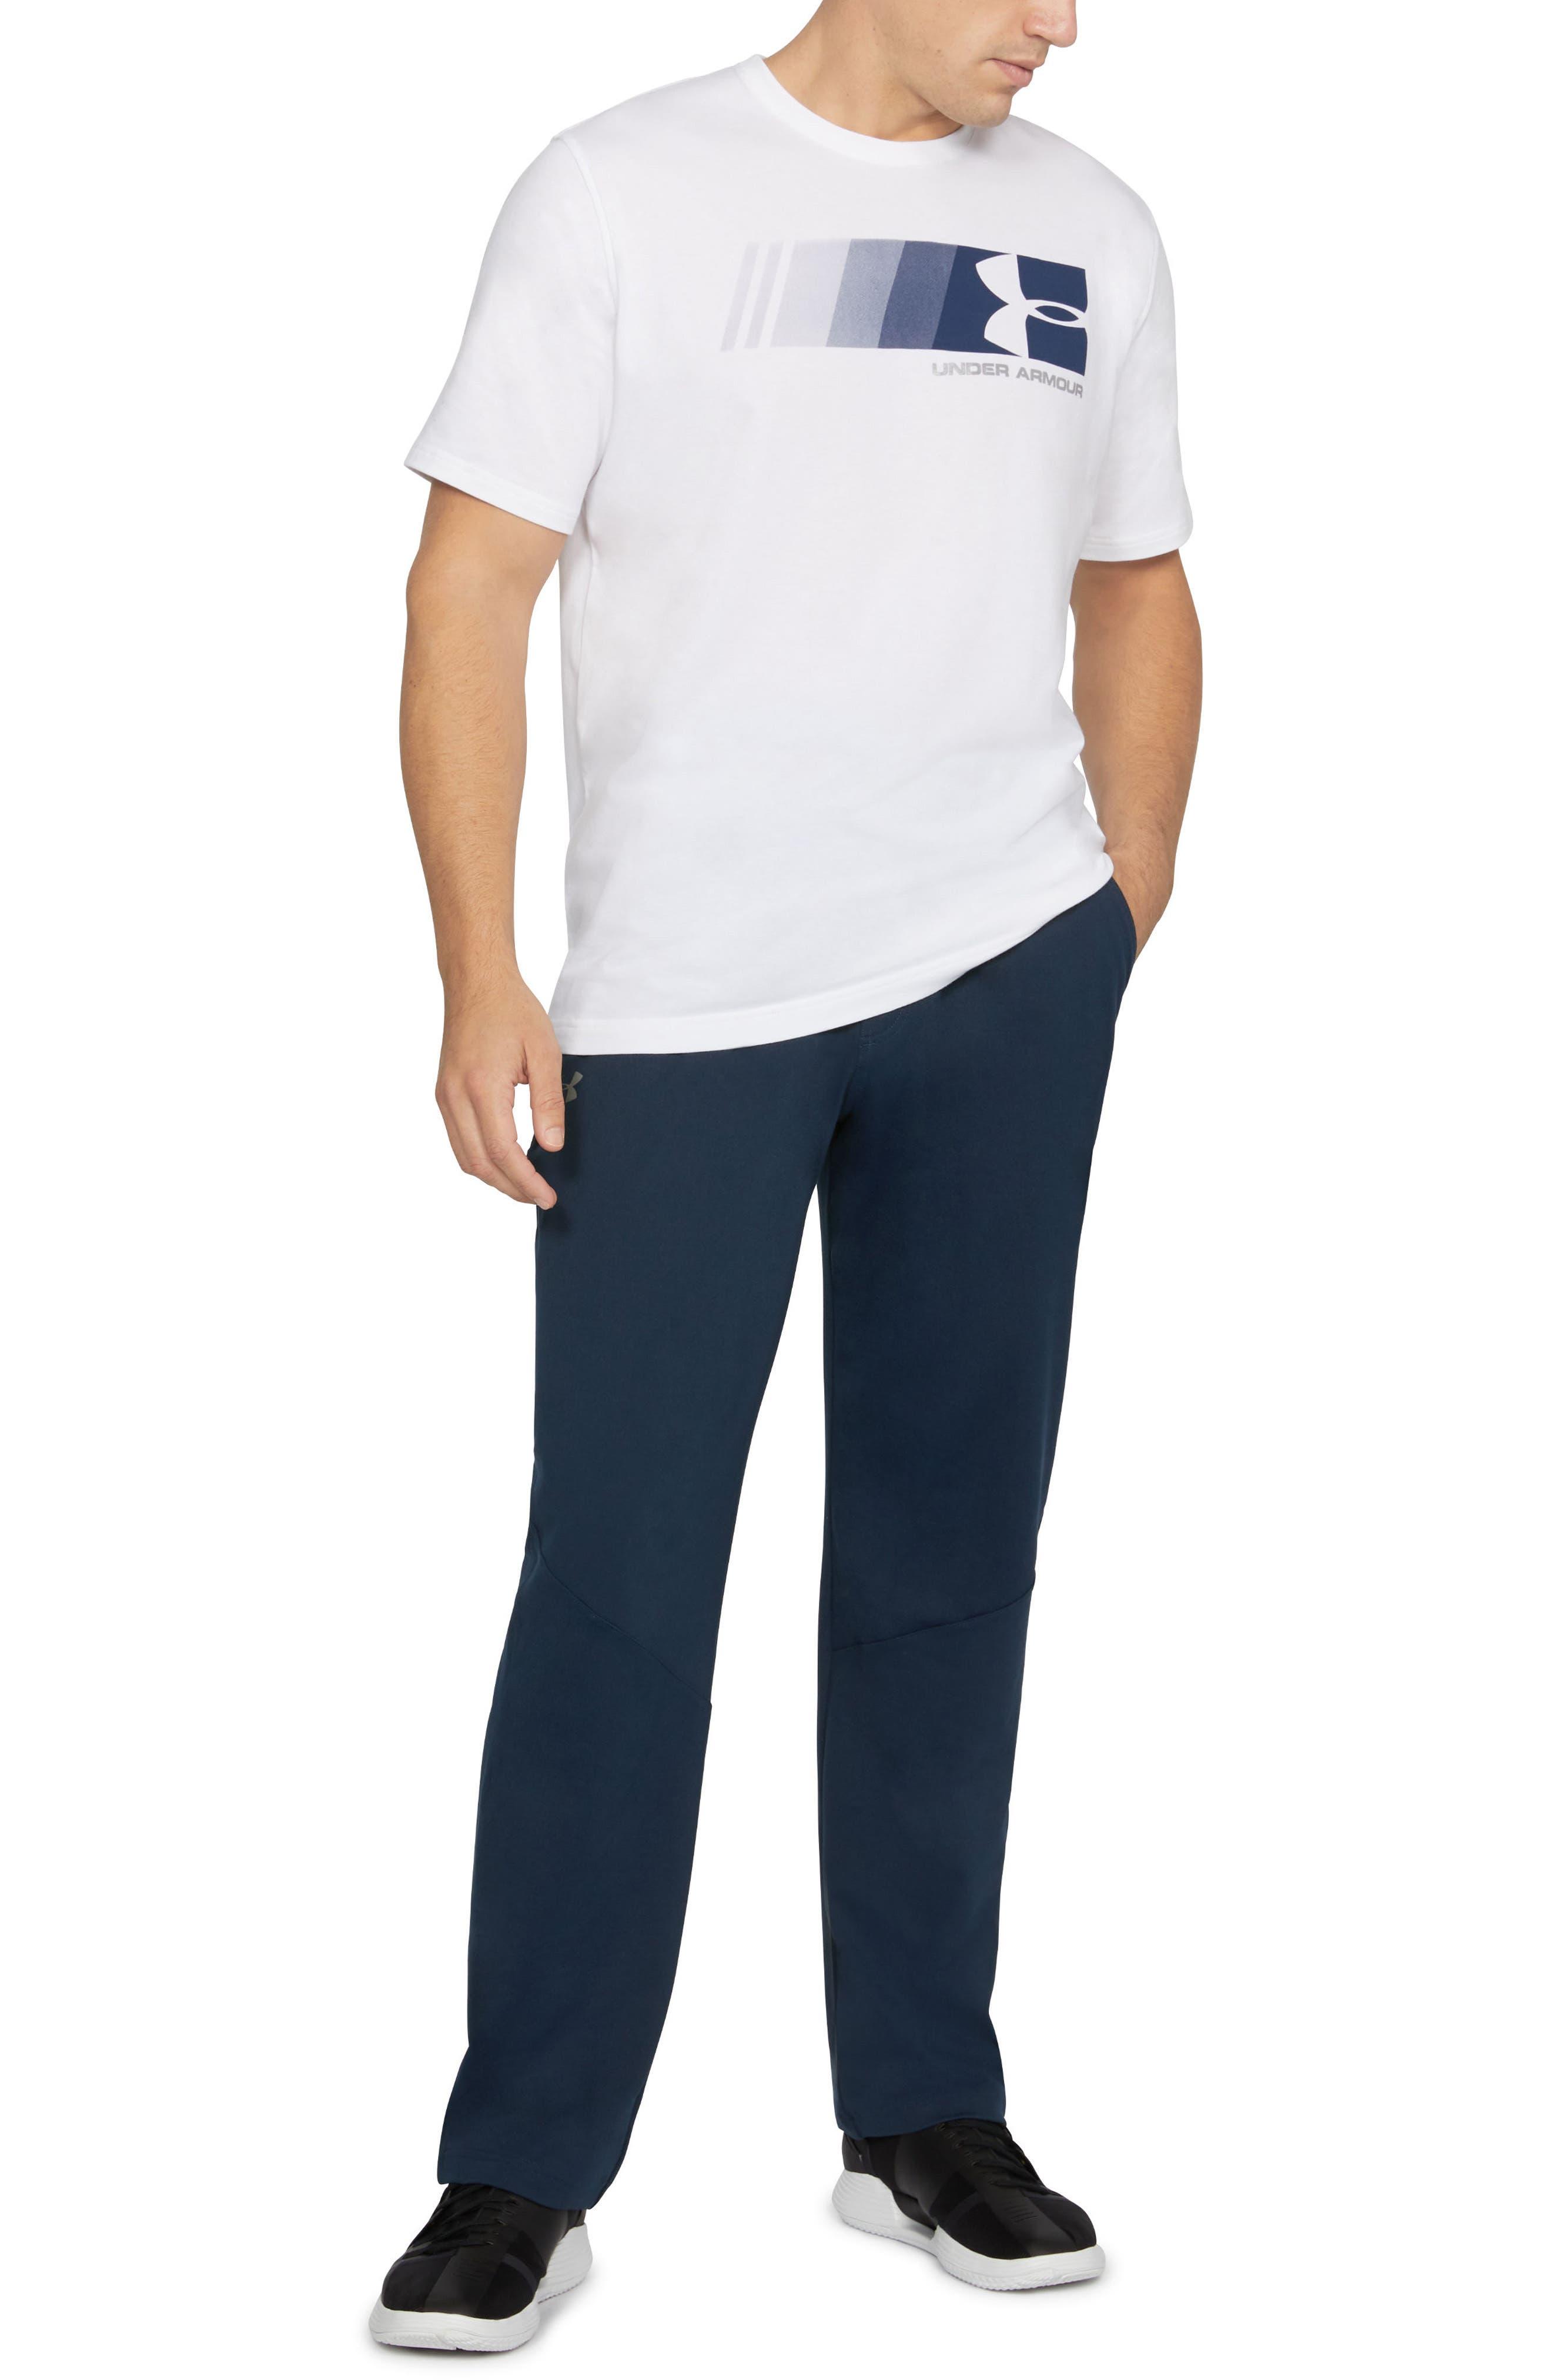 UNDER ARMOUR,                             Regular Fit Knit Training Pants,                             Main thumbnail 1, color,                             408